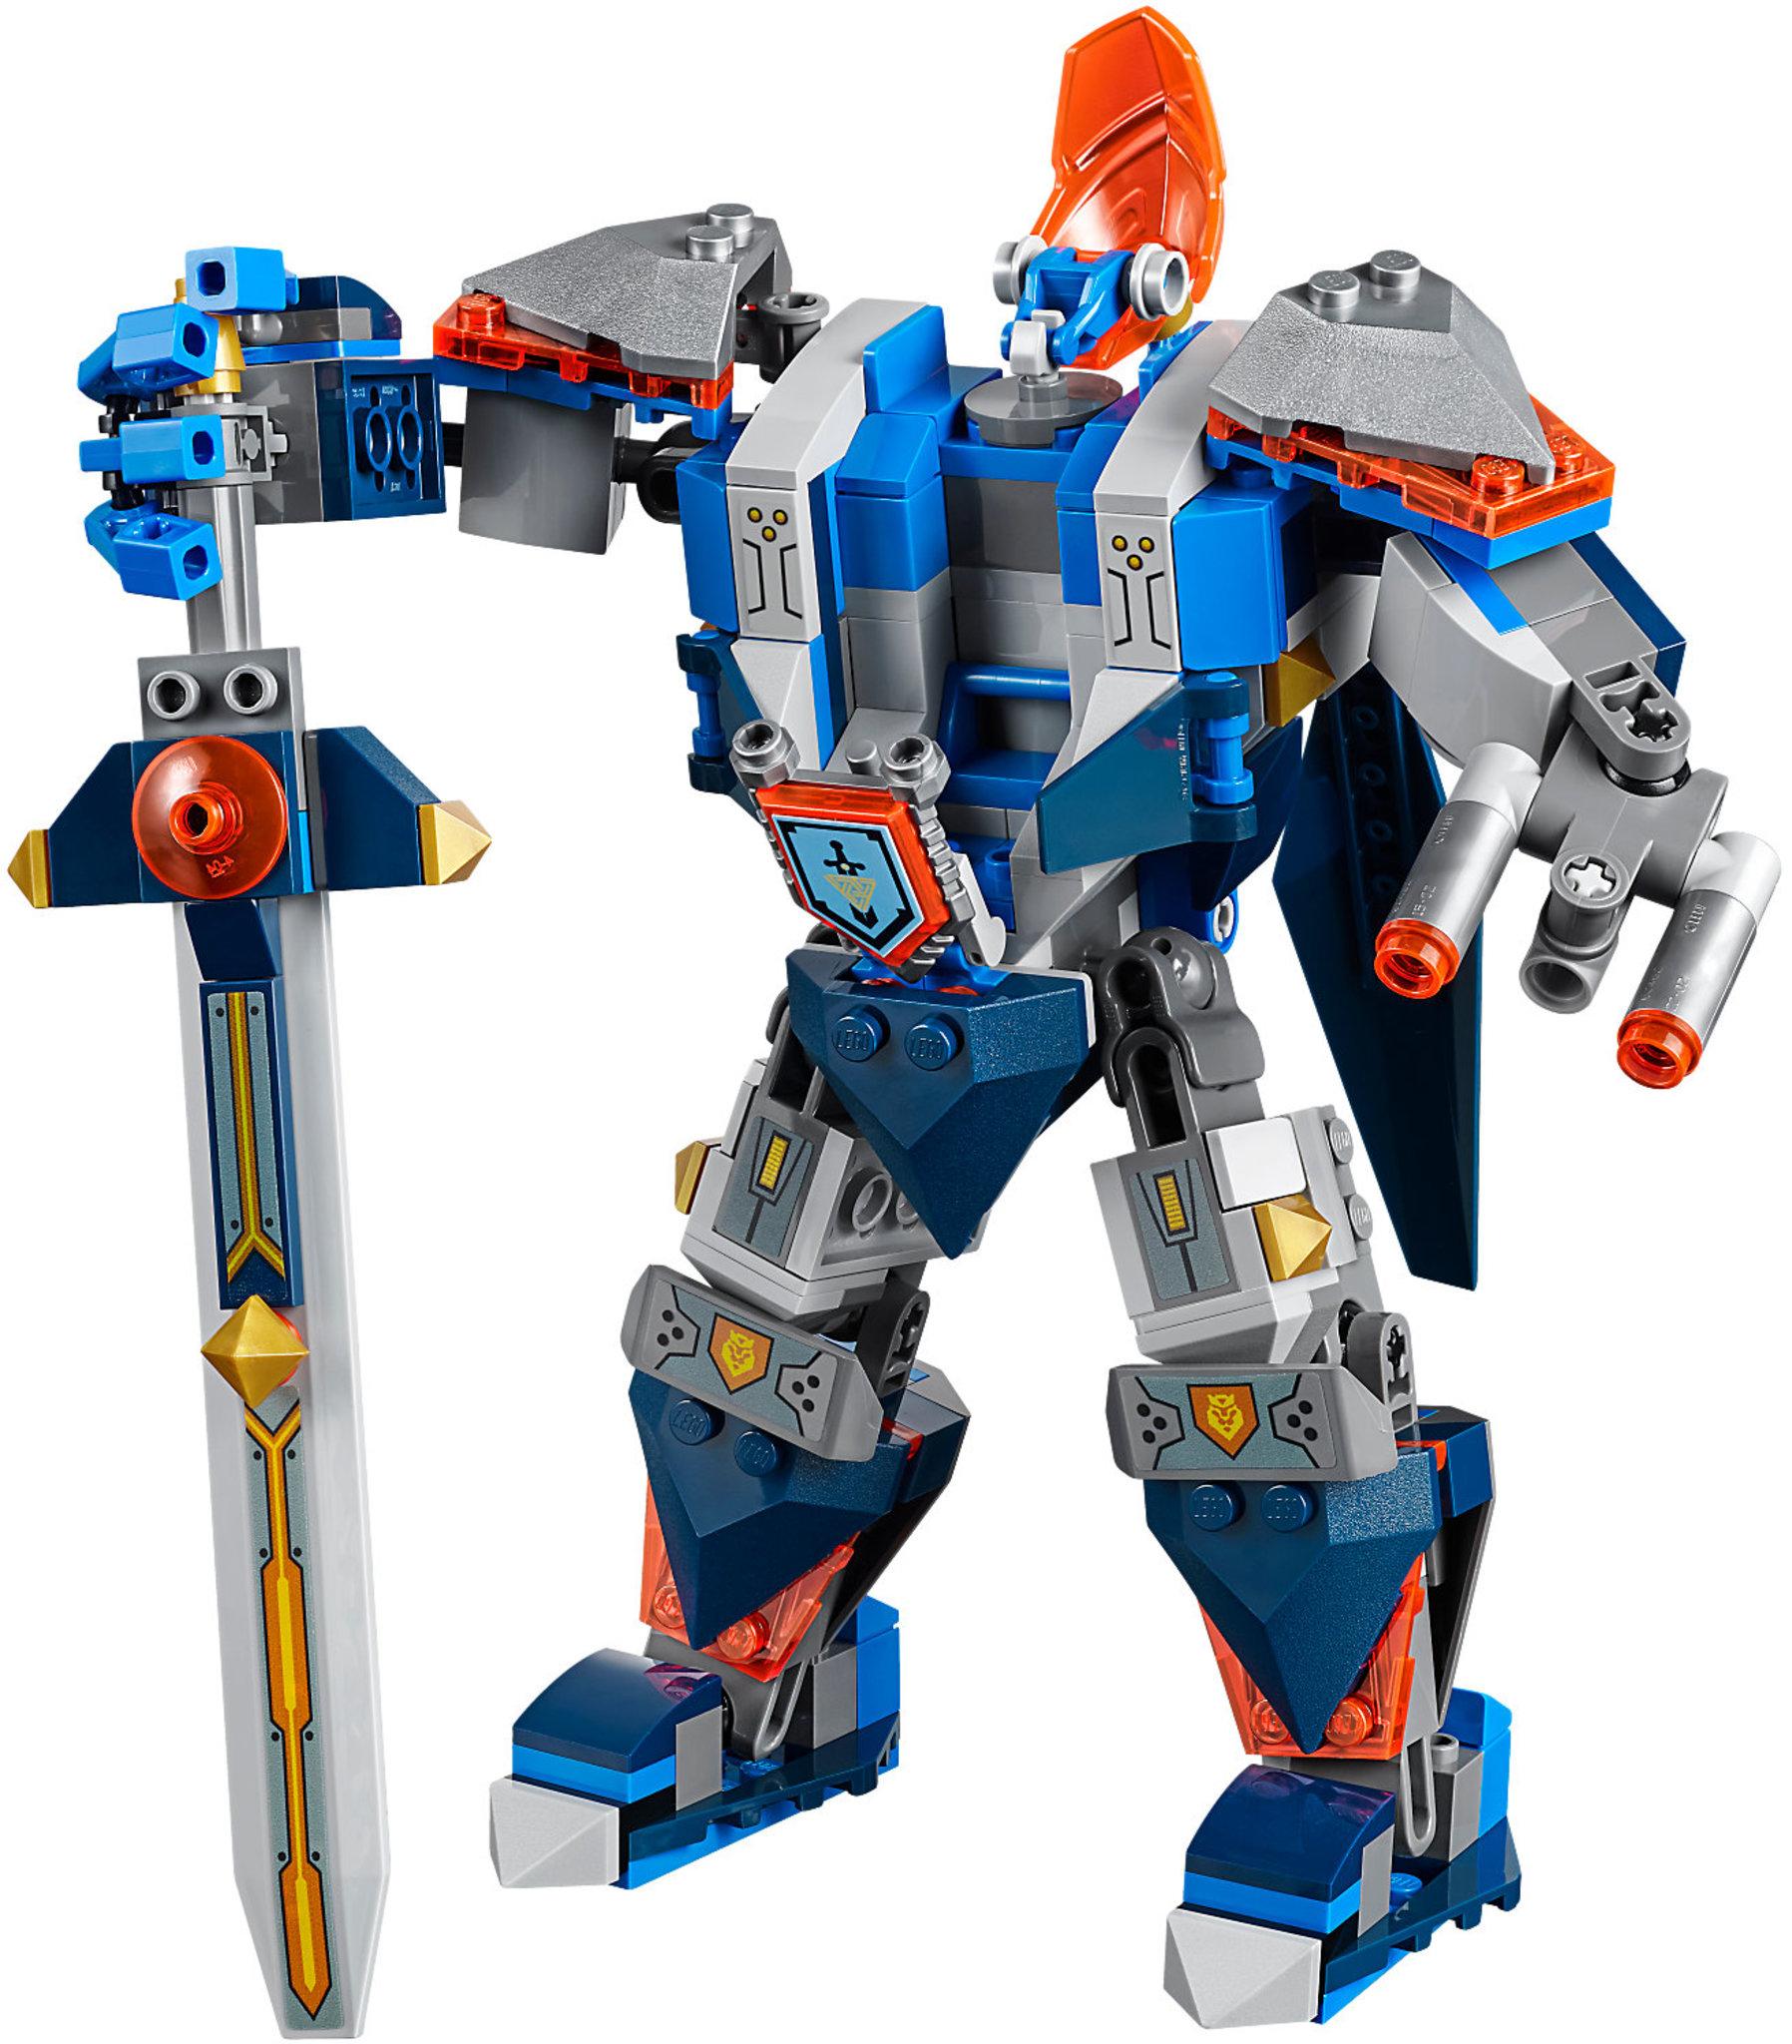 Mech Nexo Knights The King's 70327 Lego nm8wN0v